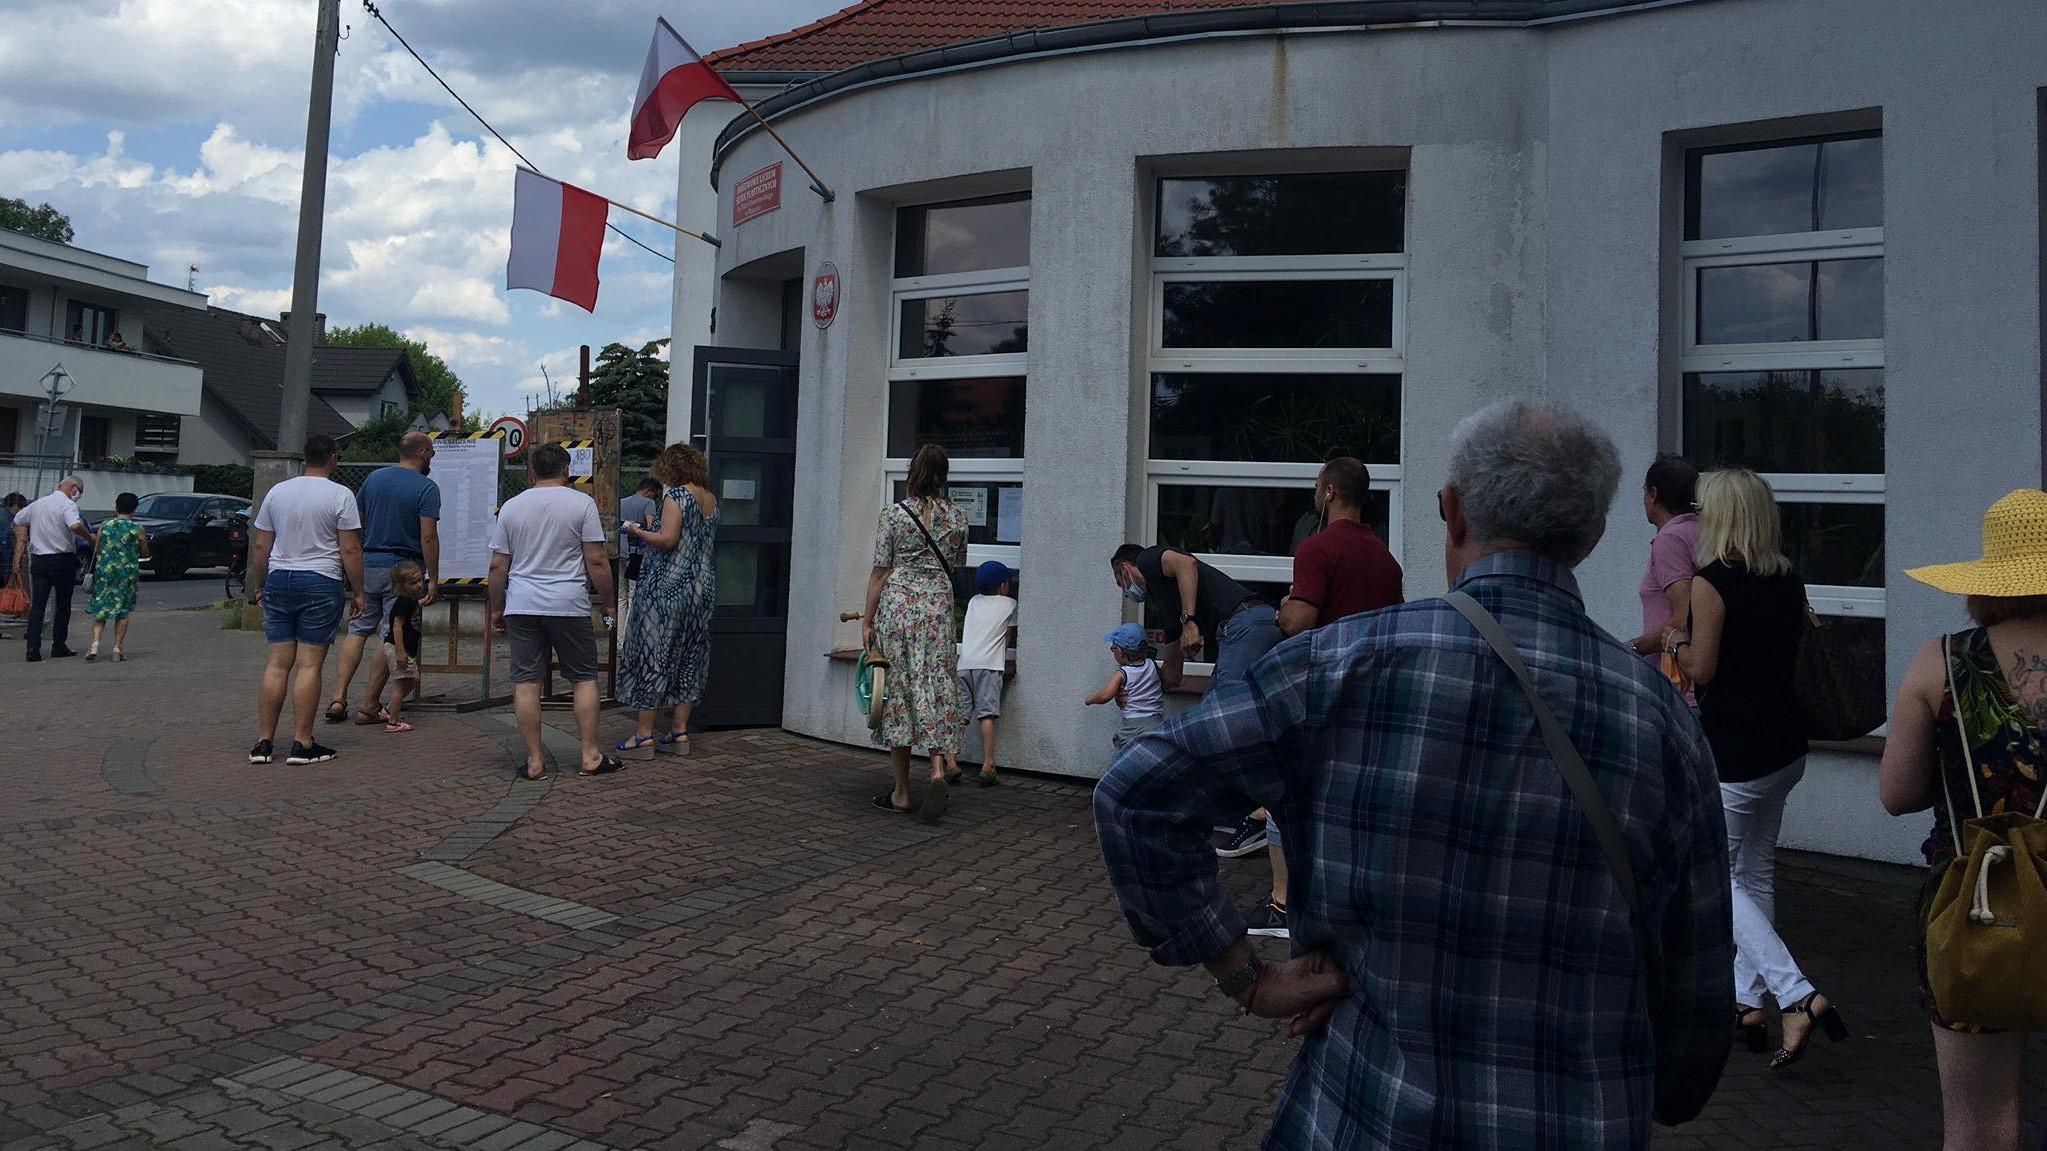 junikowo kolejka do lokalu wyborczego - Jacek Butlewski